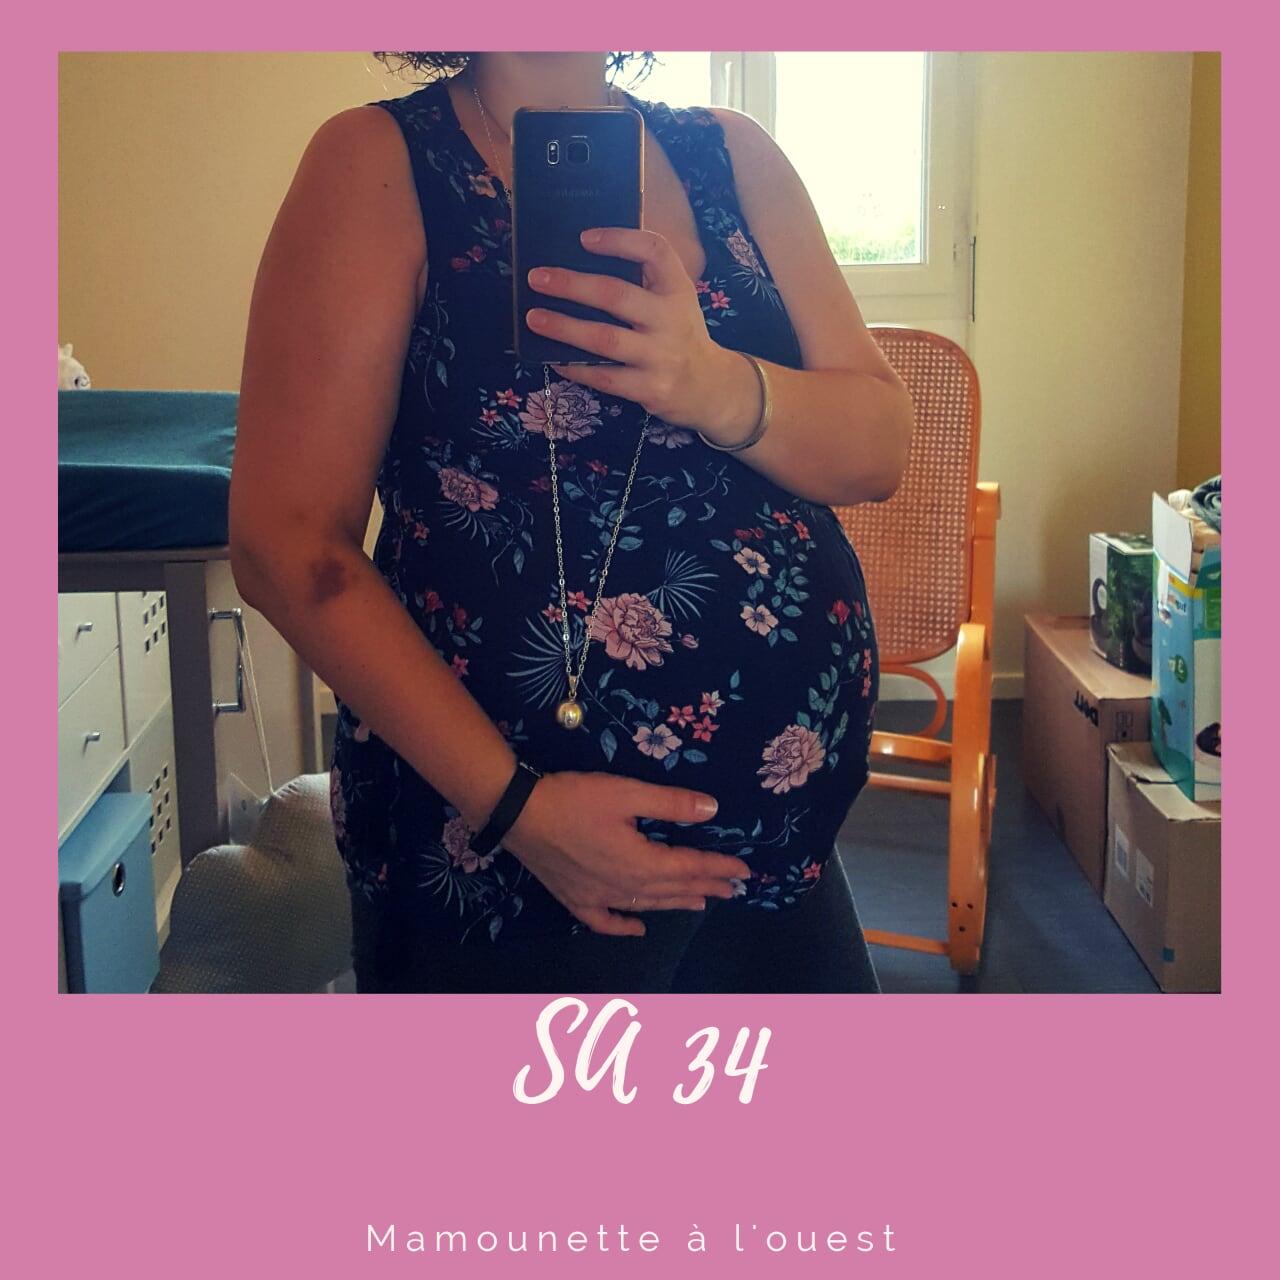 Semaine 34 de grossesse